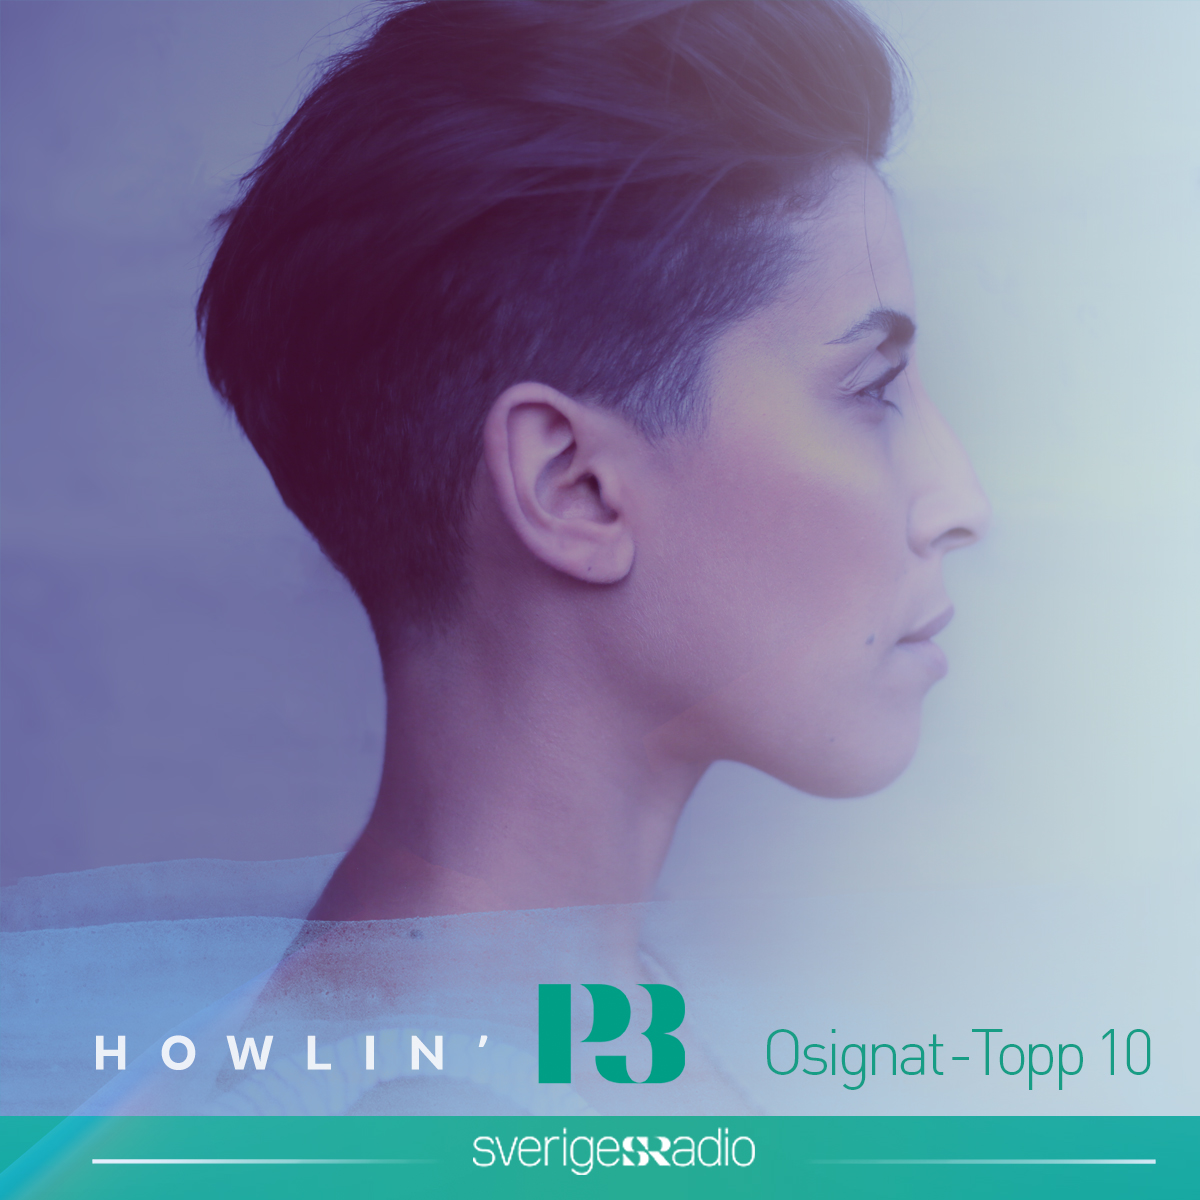 radiop3_howlin.jpg